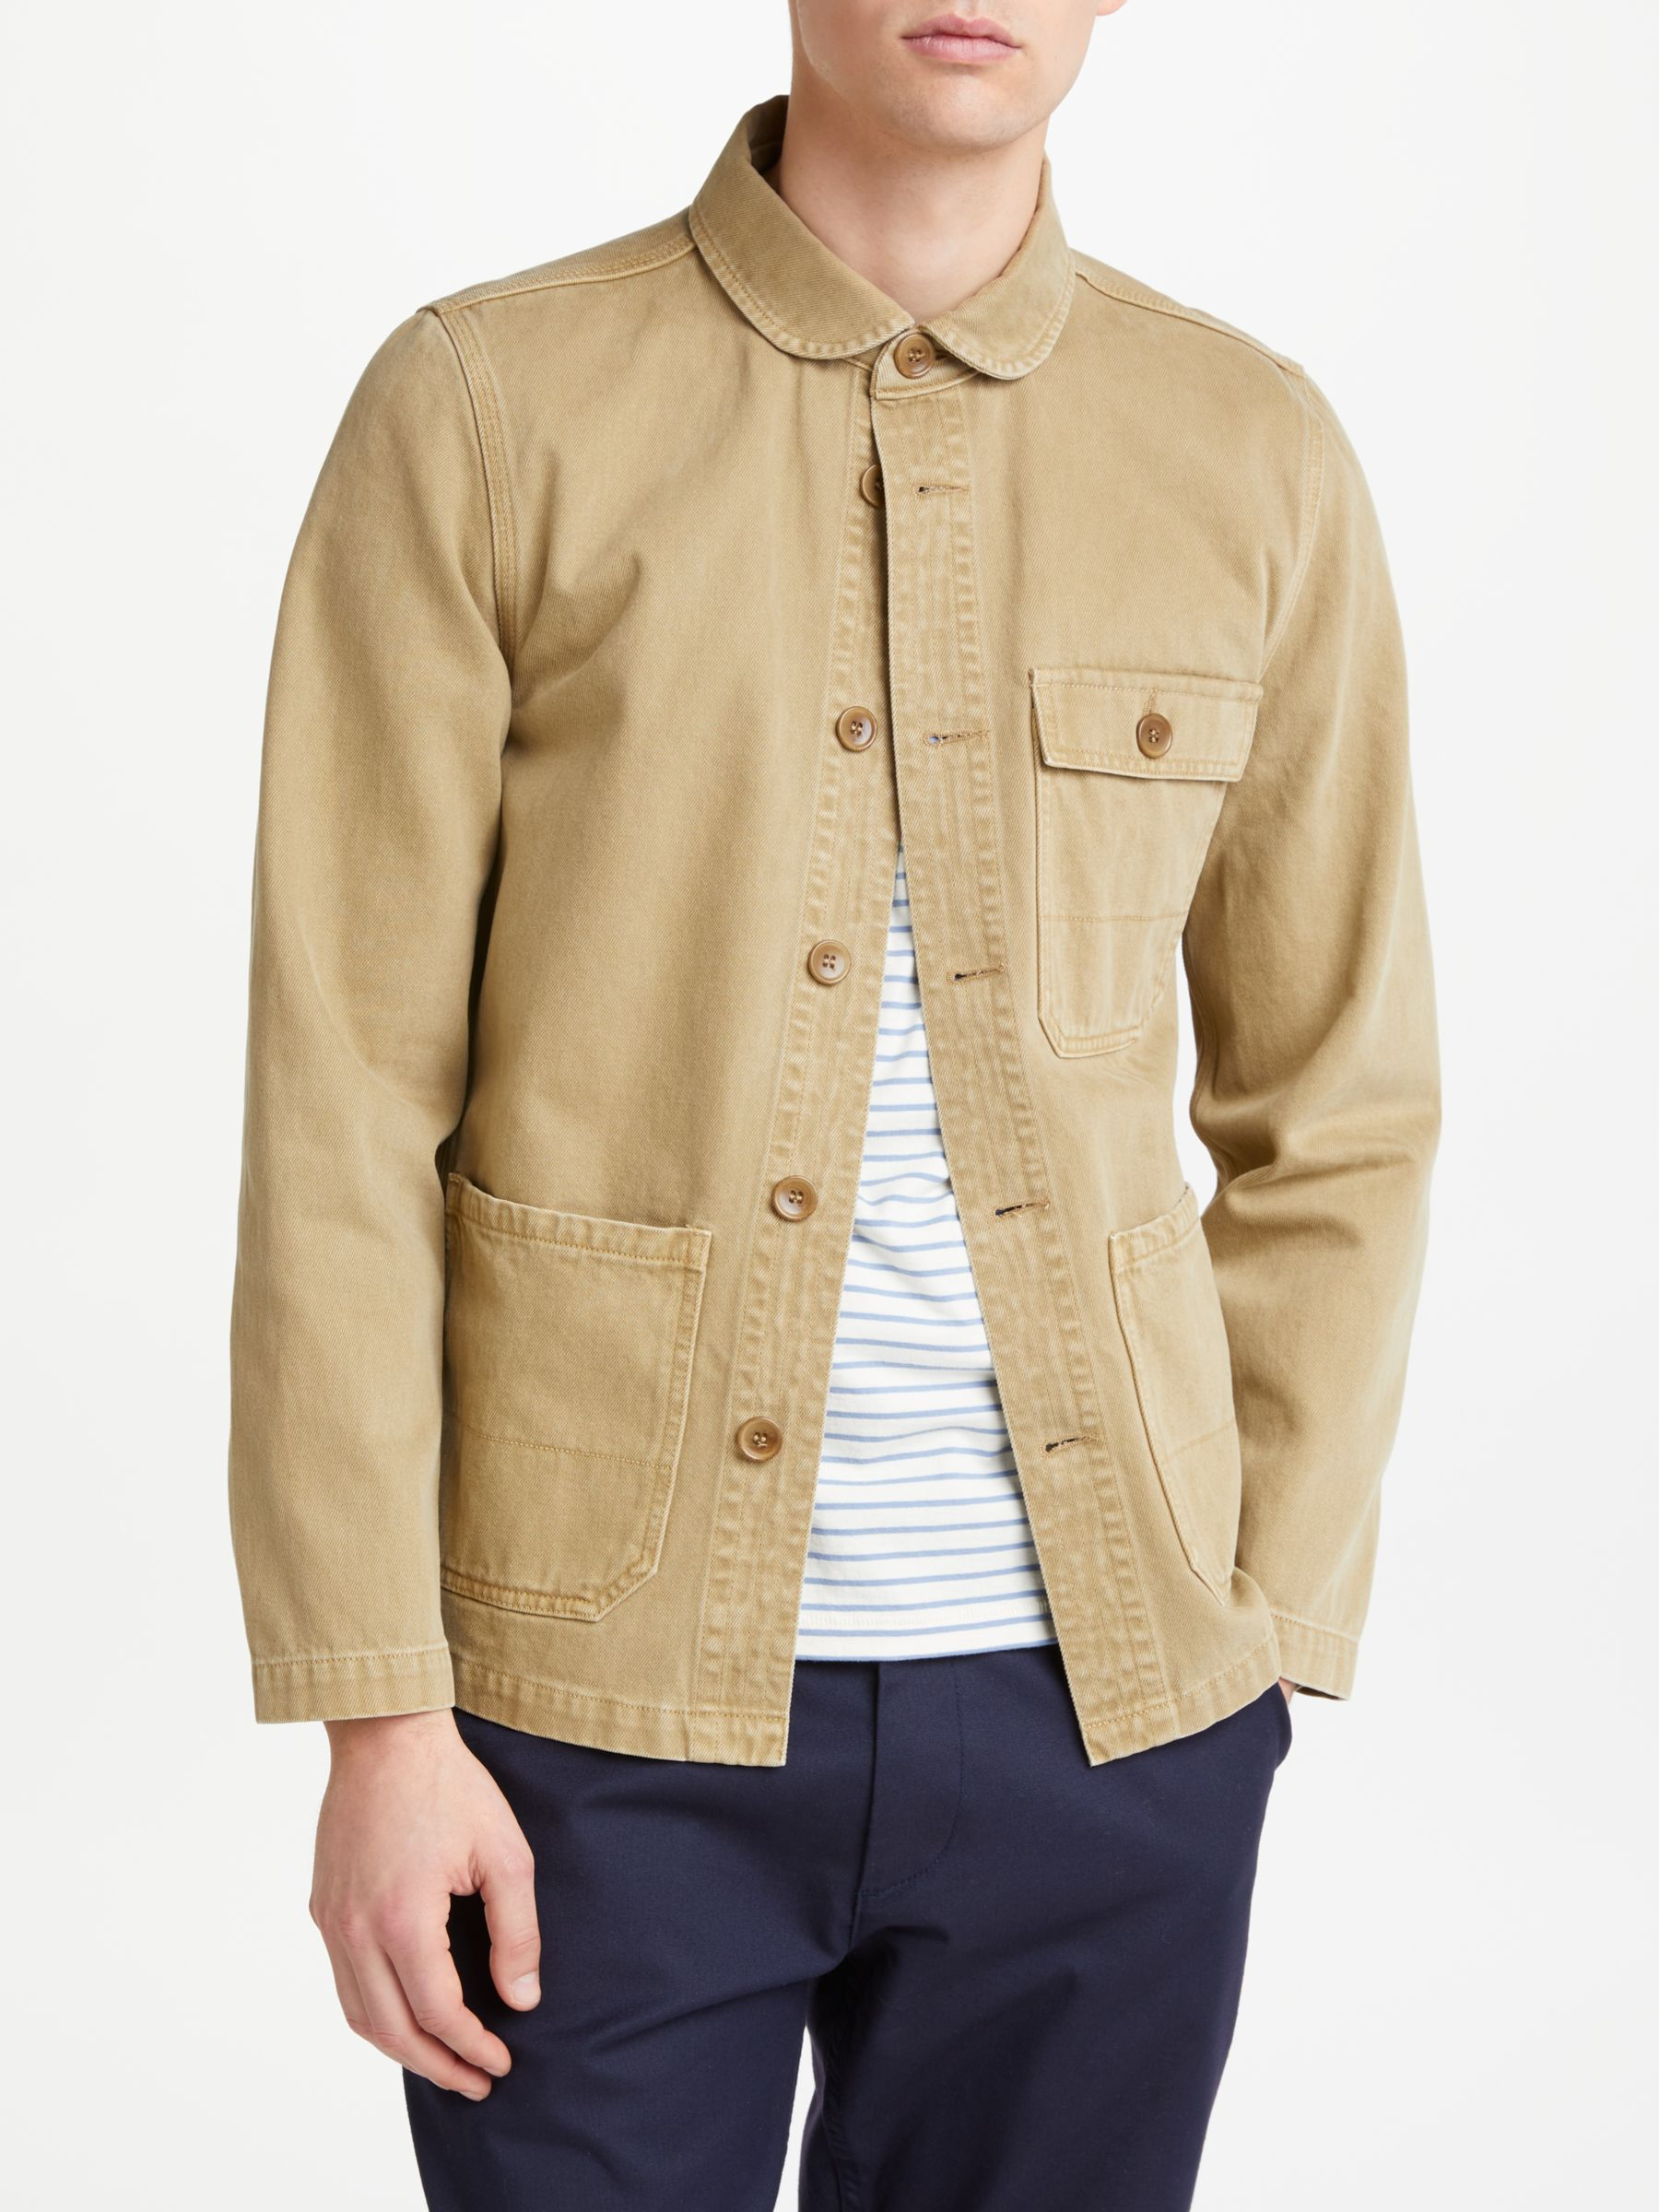 JOHN LEWIS & Co. French Workwear Jacket, Stone at John Lewis & Partners